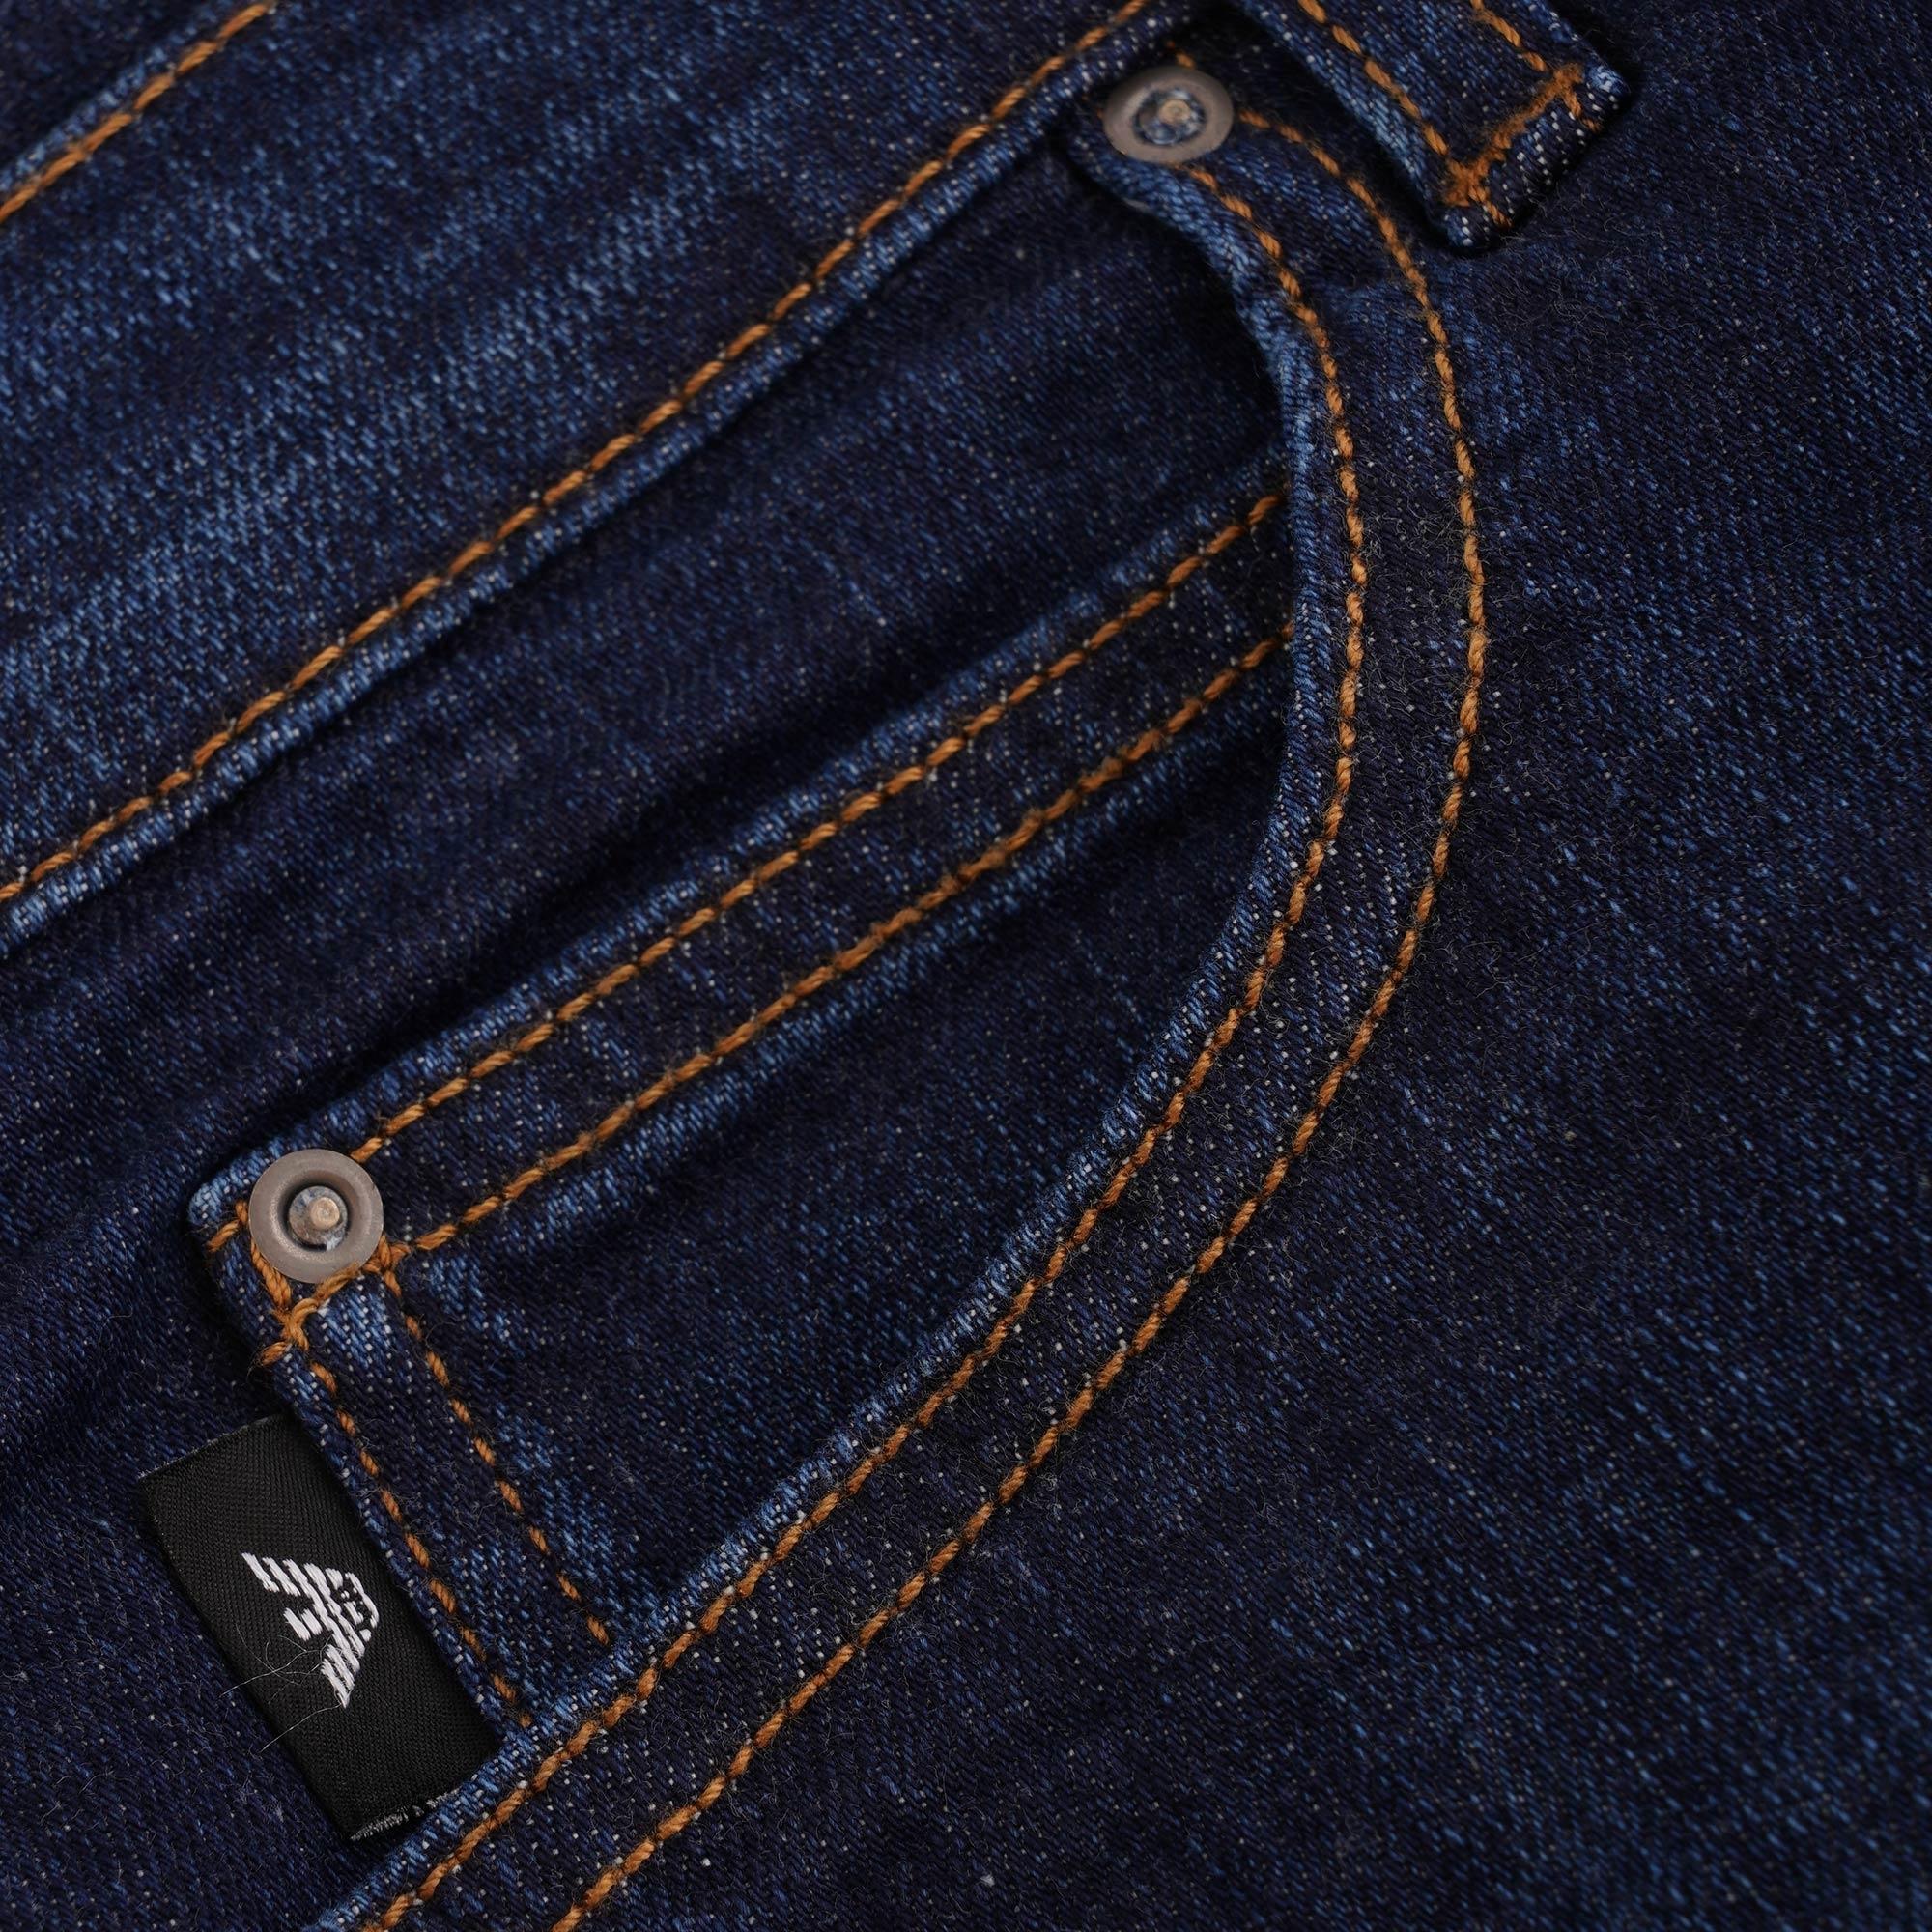 9dec02659b8a J21 Regular Fit Stretch Denim Jeans - Denim Blue